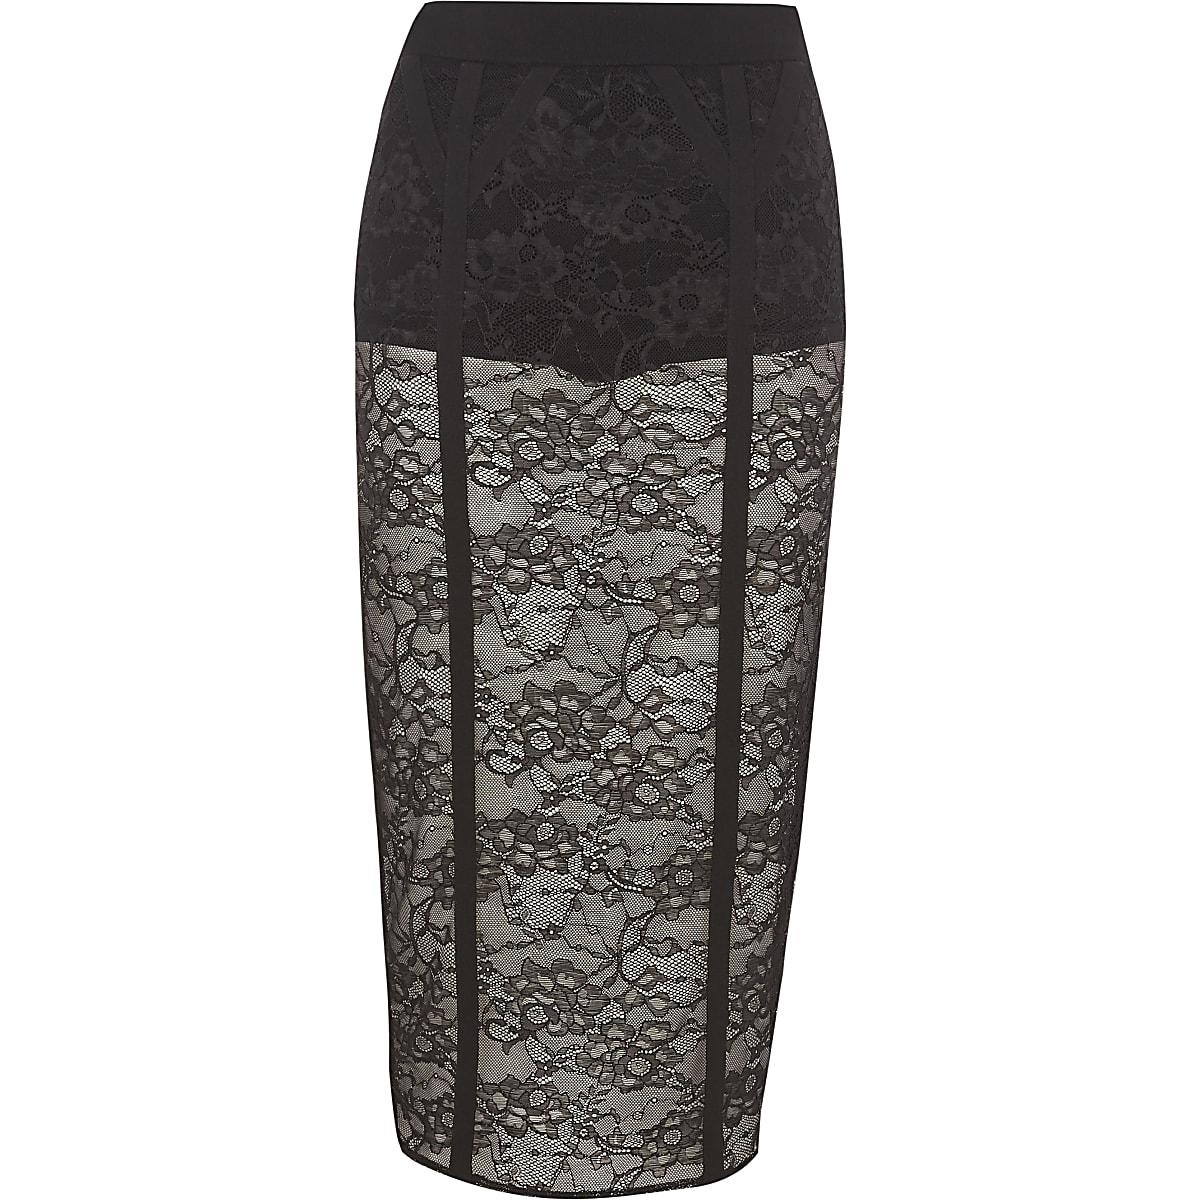 Black lace panel pencil skirt